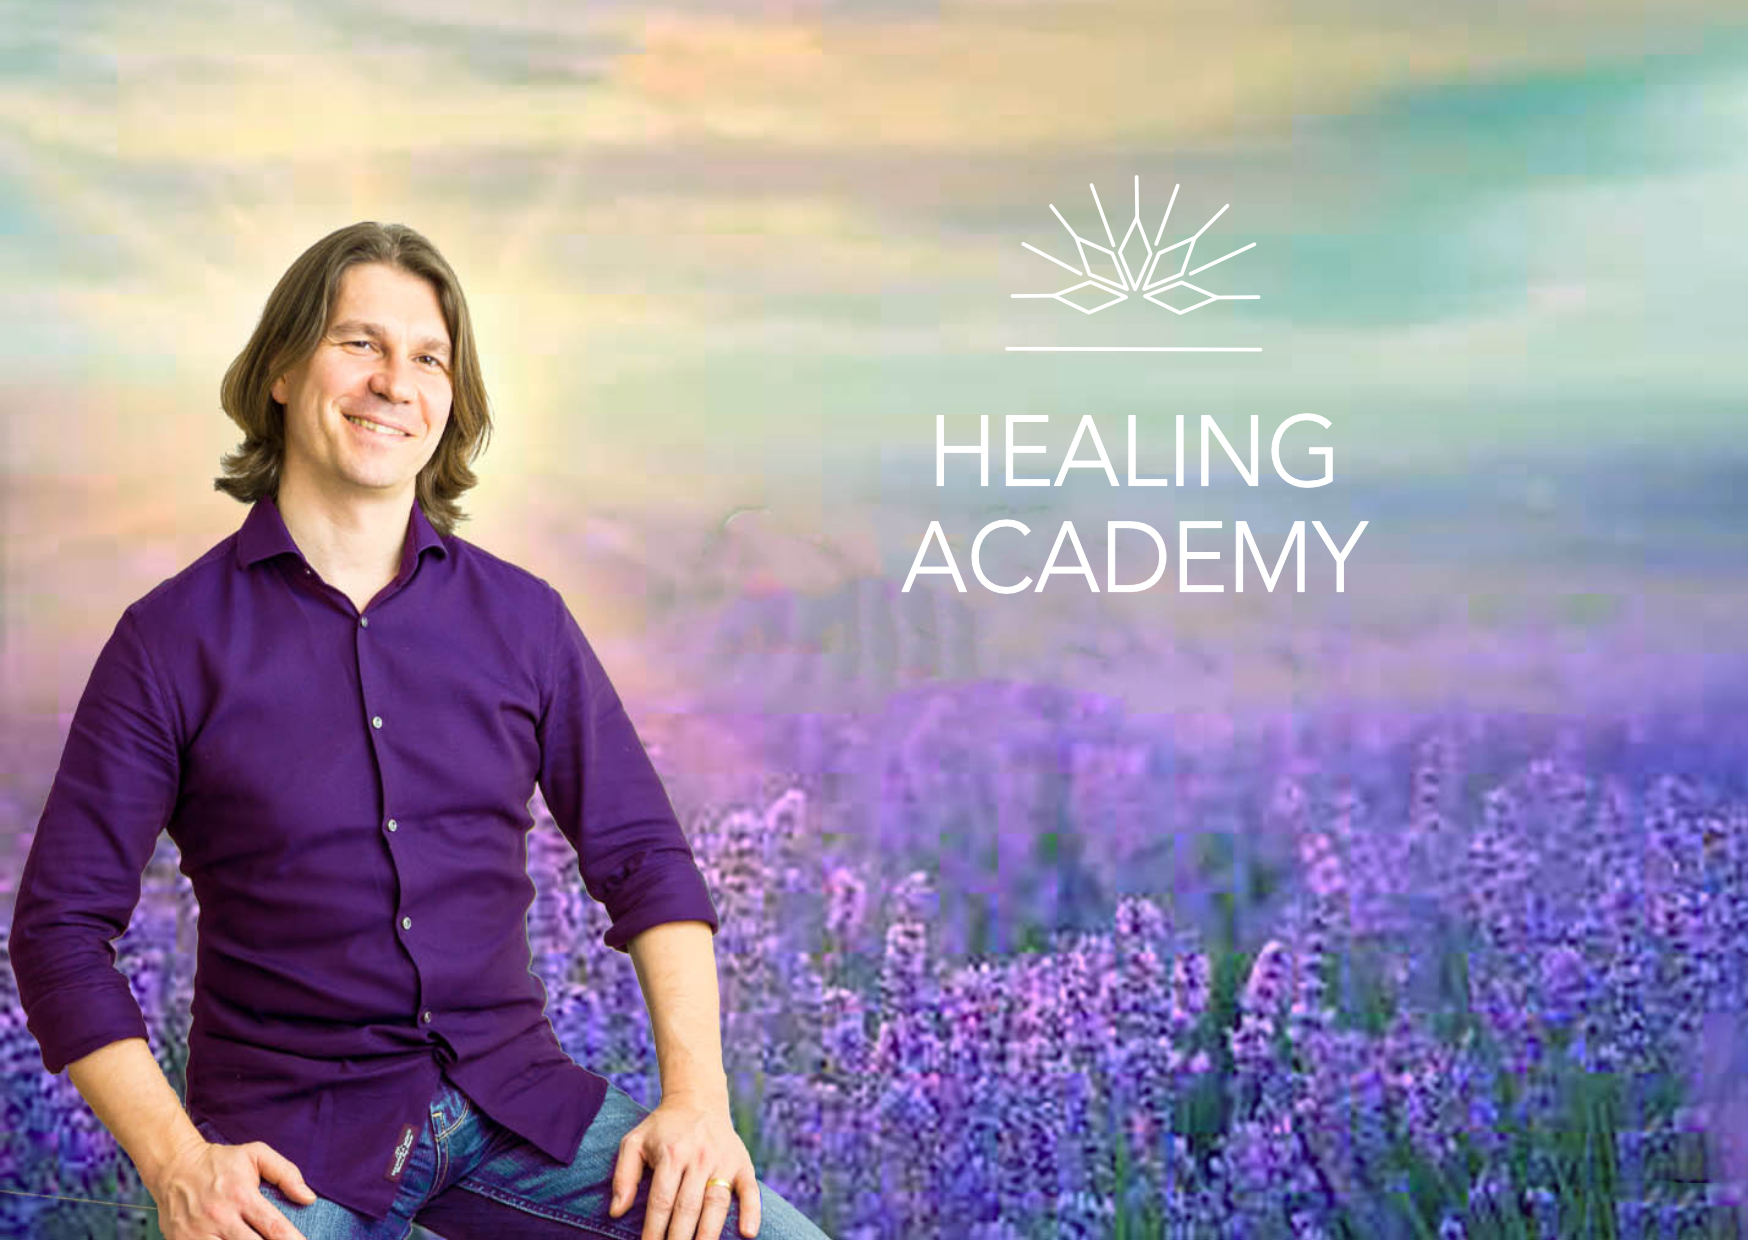 Healing_Academy_Titel